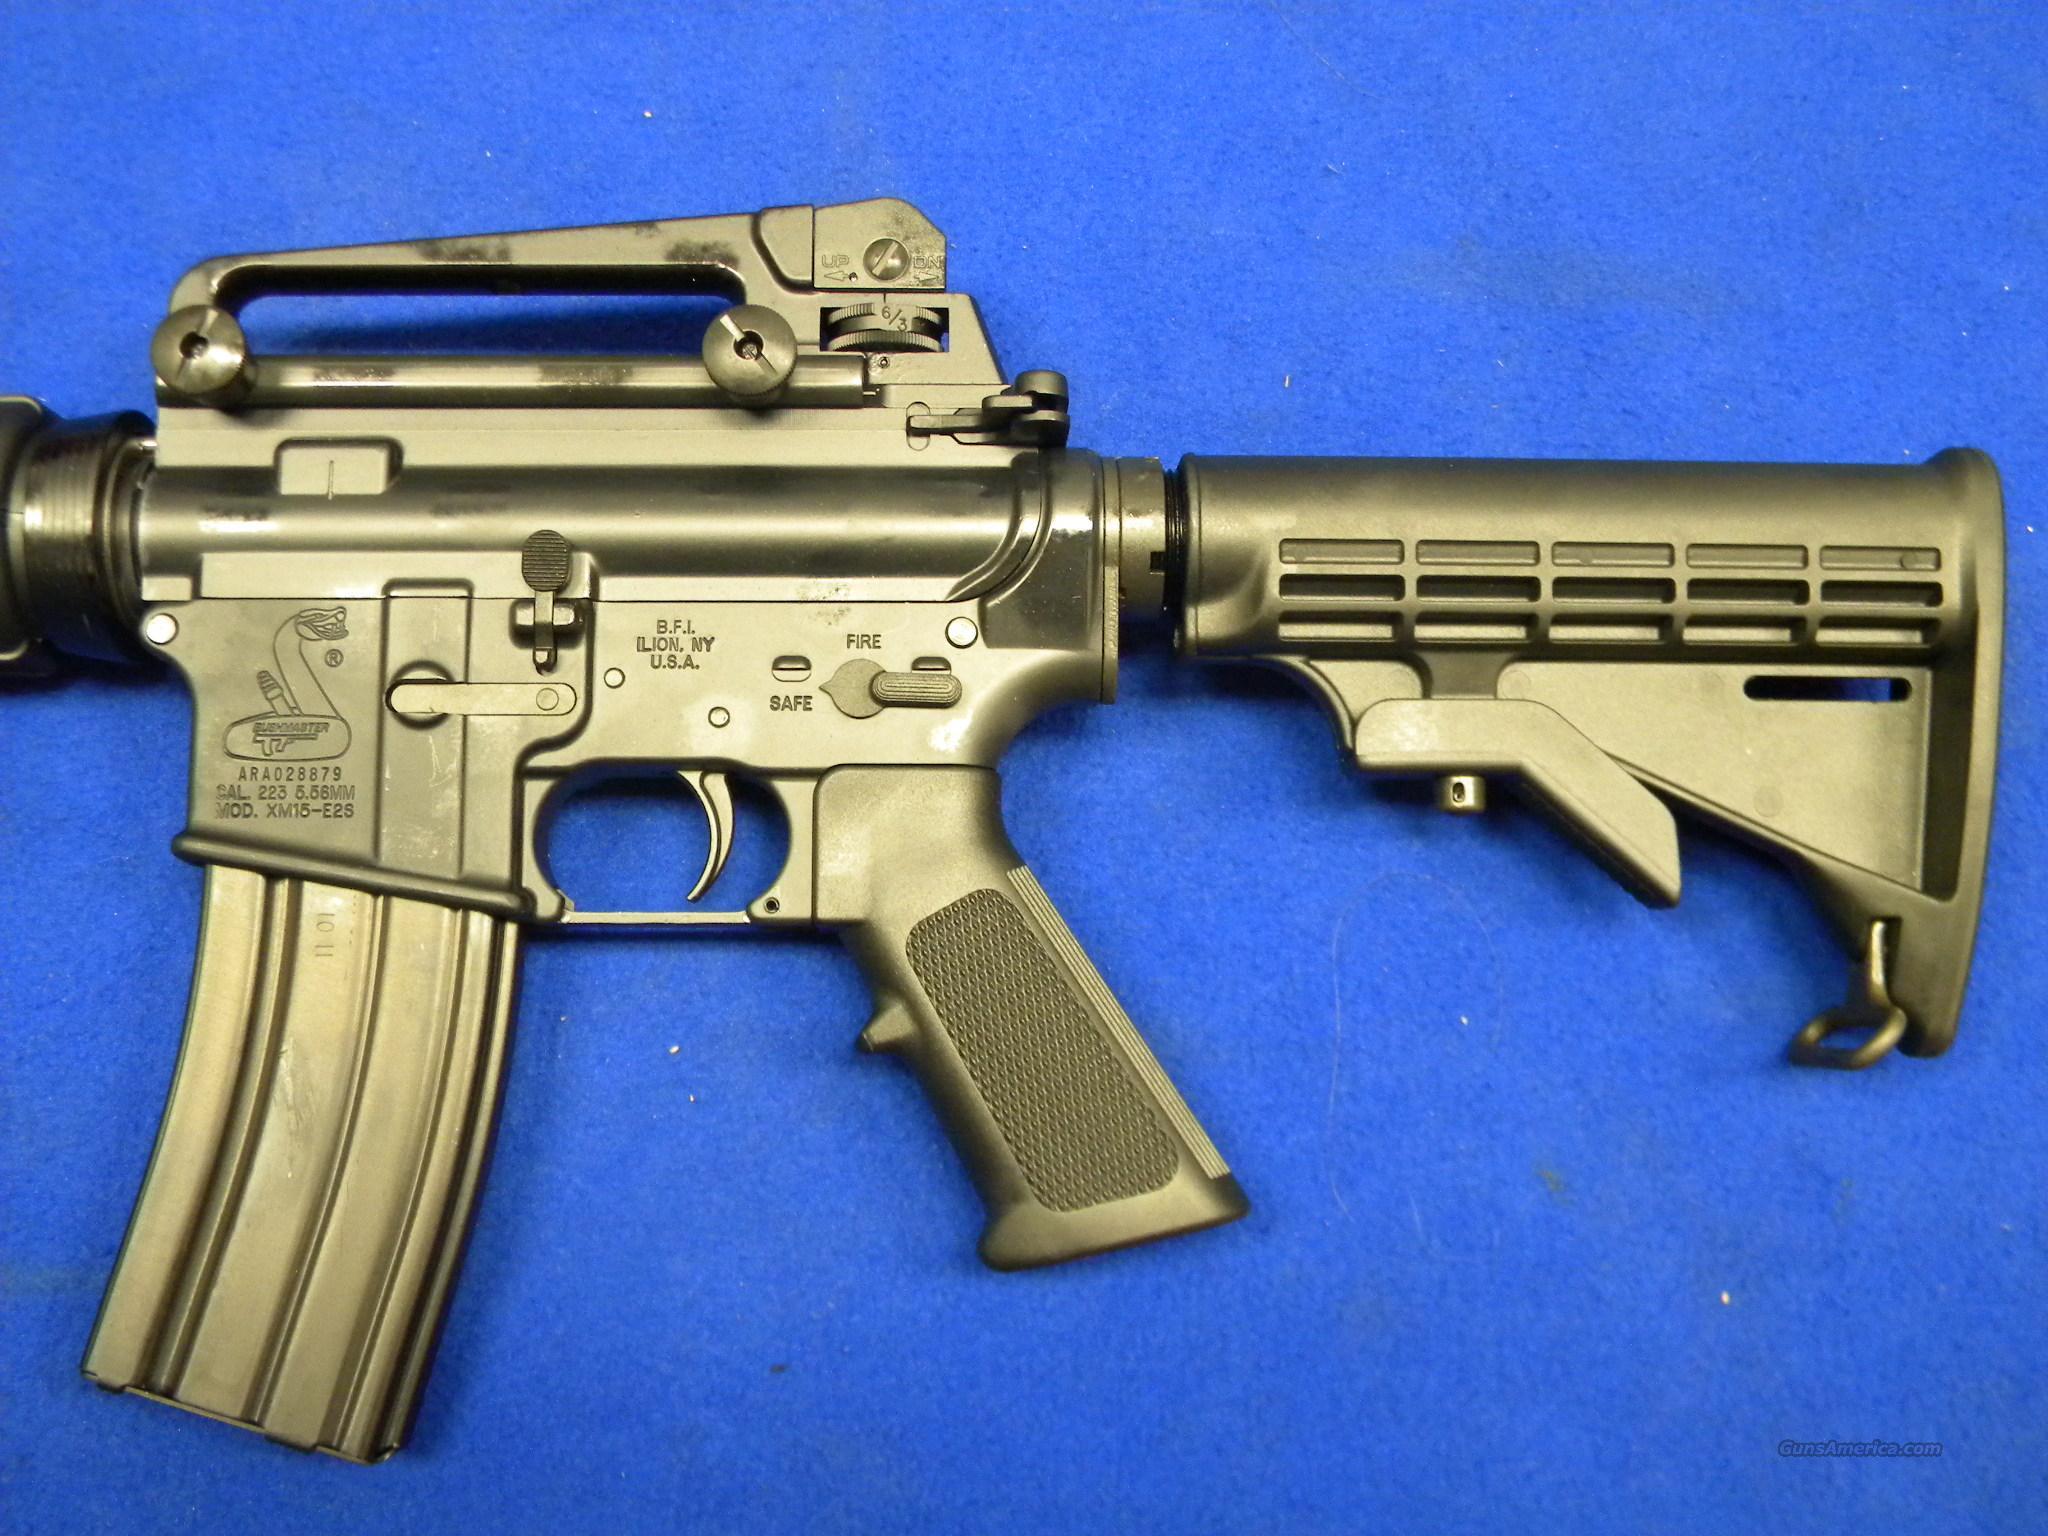 Bushmaster M4A3 Patrolman's .223 Rem/5.56 NATO For Sale